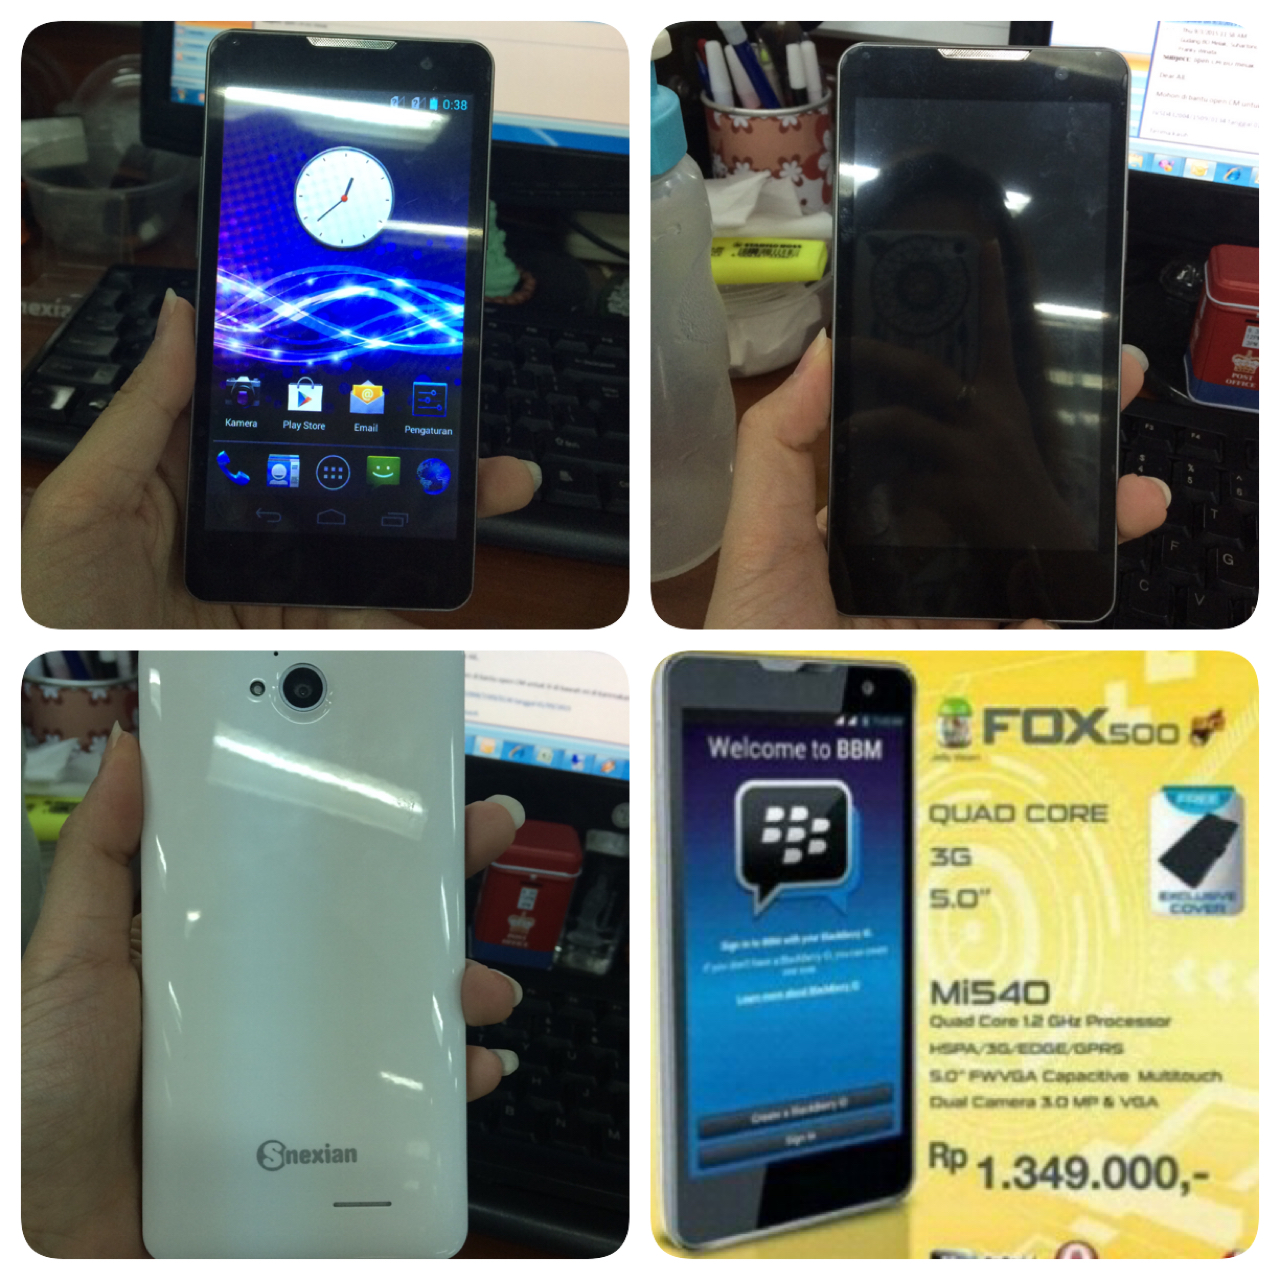 Jual Hp Android Murah S Nexian Fox500 Mi540 Aquawisely Tokopedia